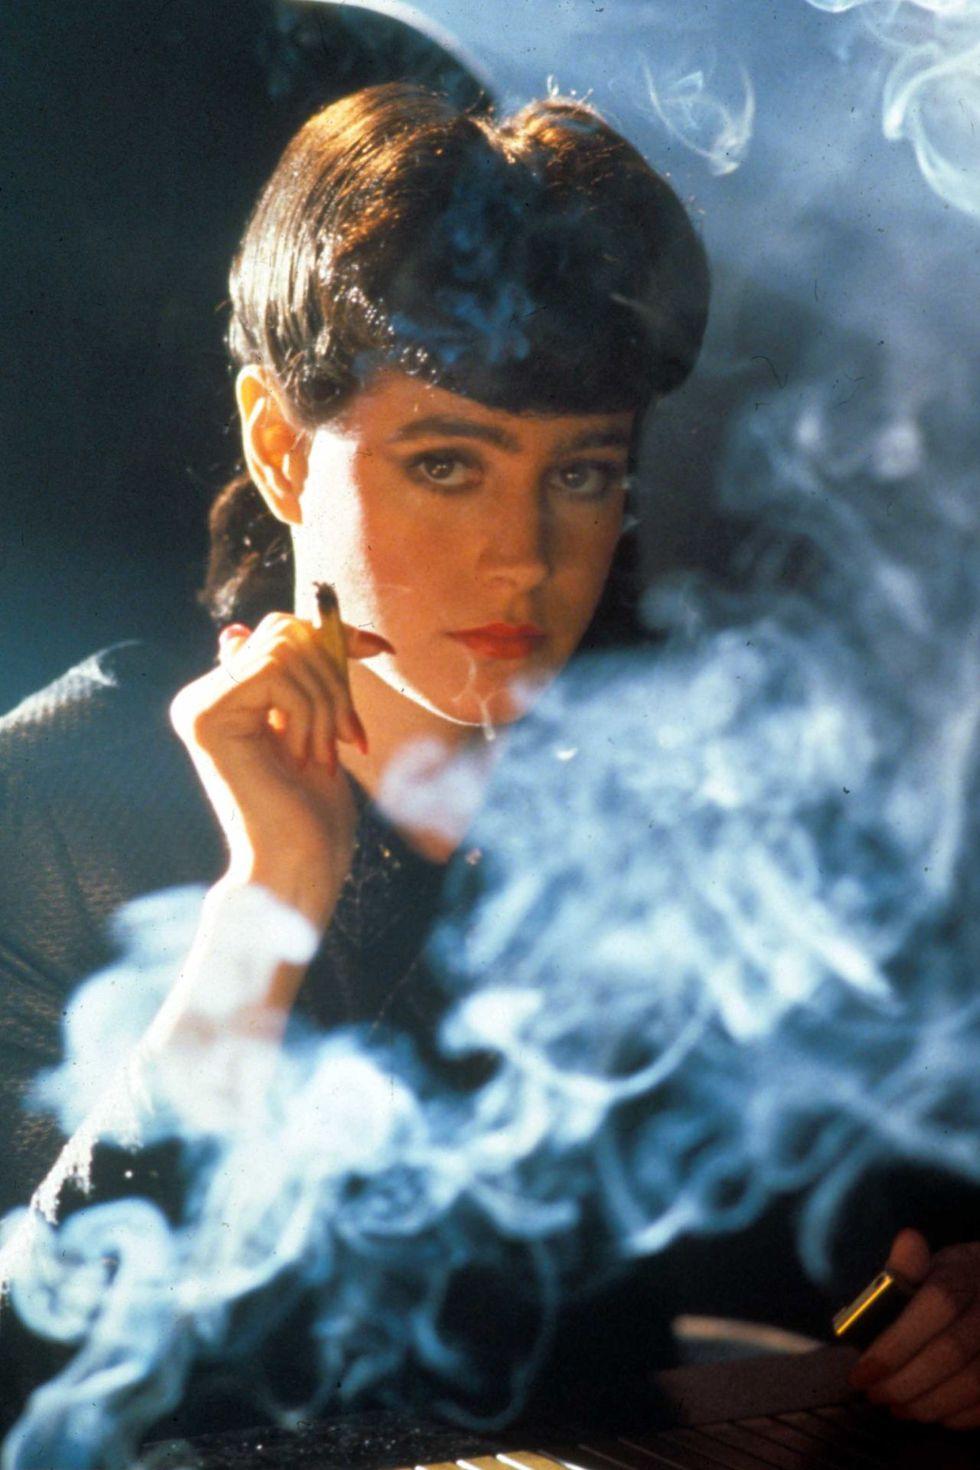 Blade Runner-Live, Sean Young as Rachael